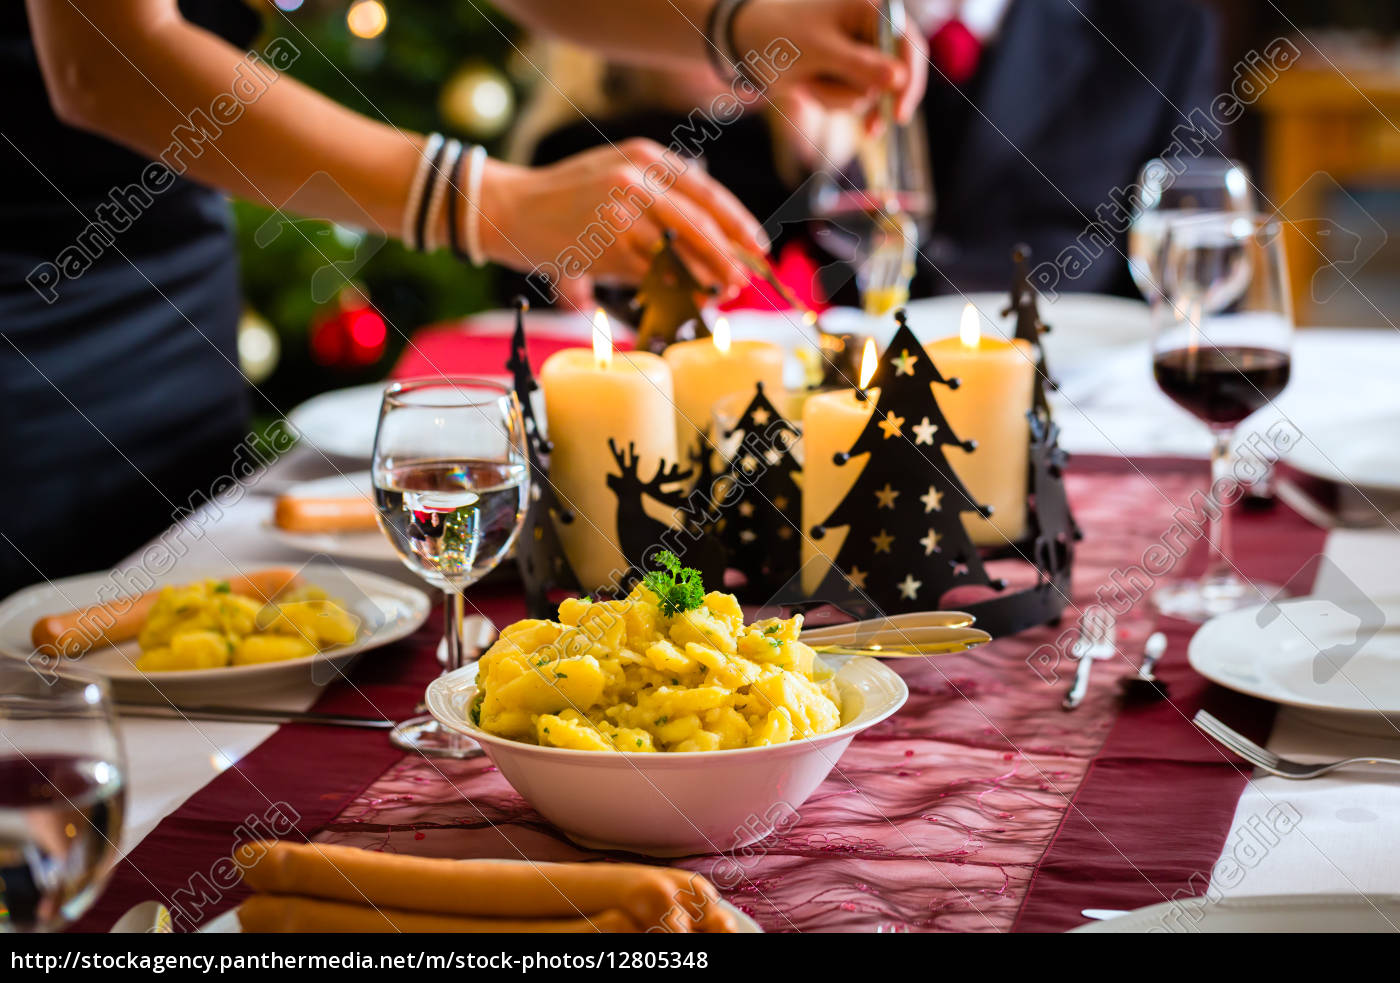 Royalty free photo 12805348 - traditional german christmas dinner sausages and potato salad